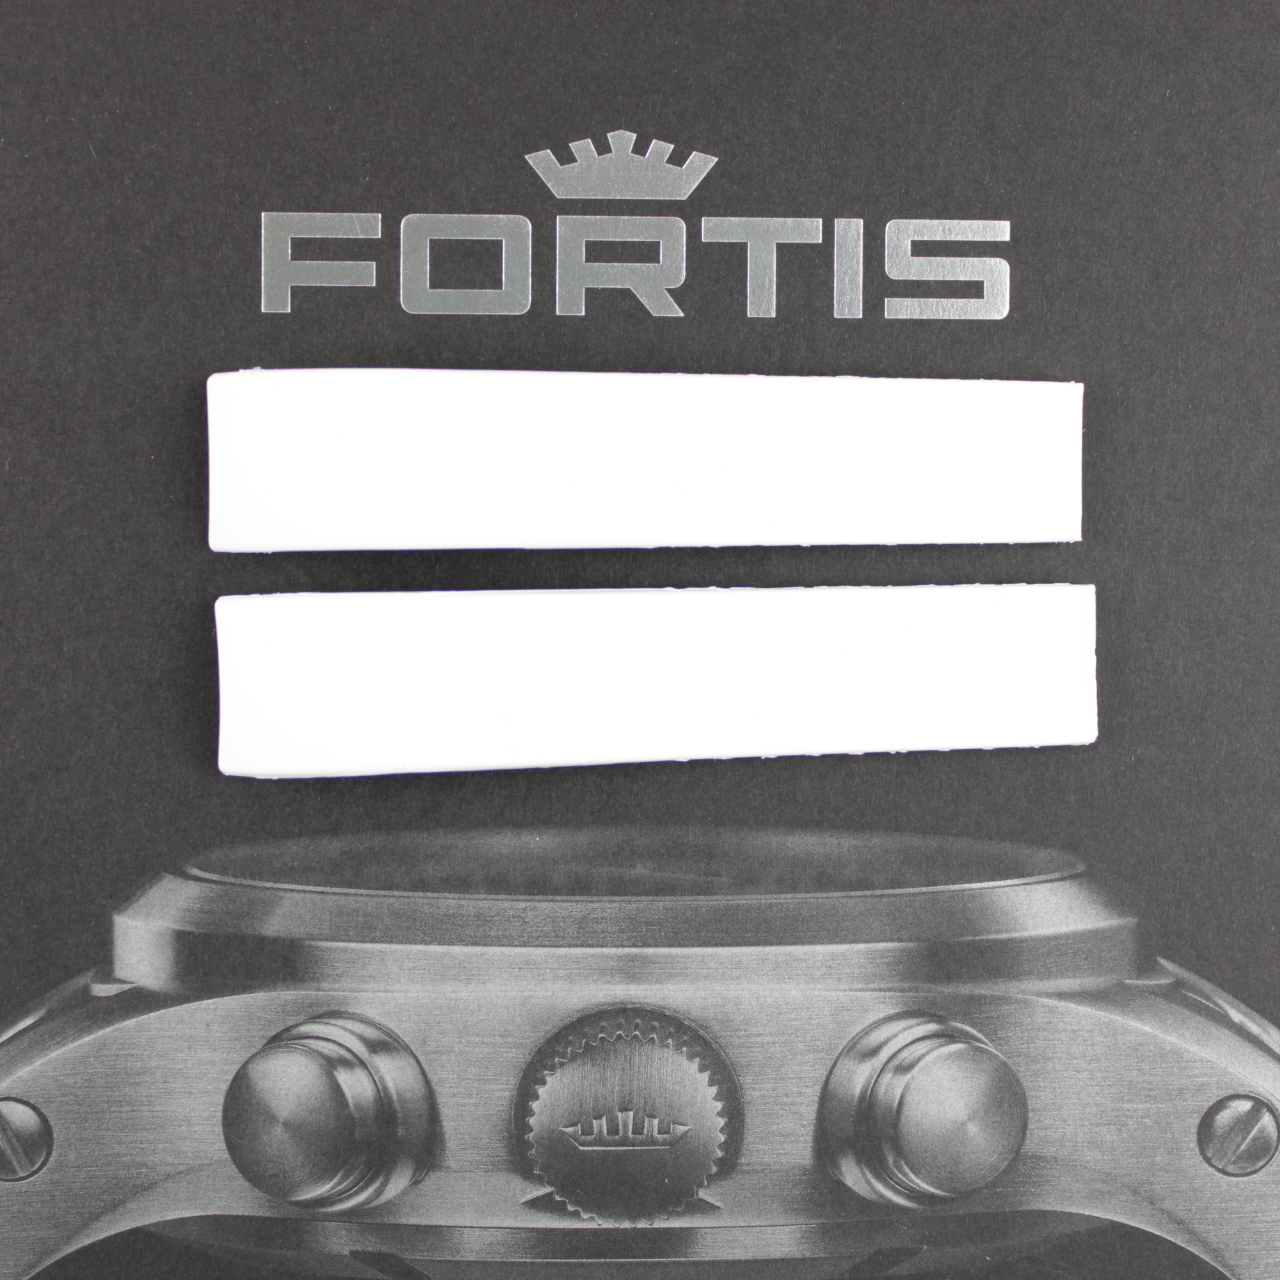 Fortis Spacematic Silikonband mit integrierten Anstoß